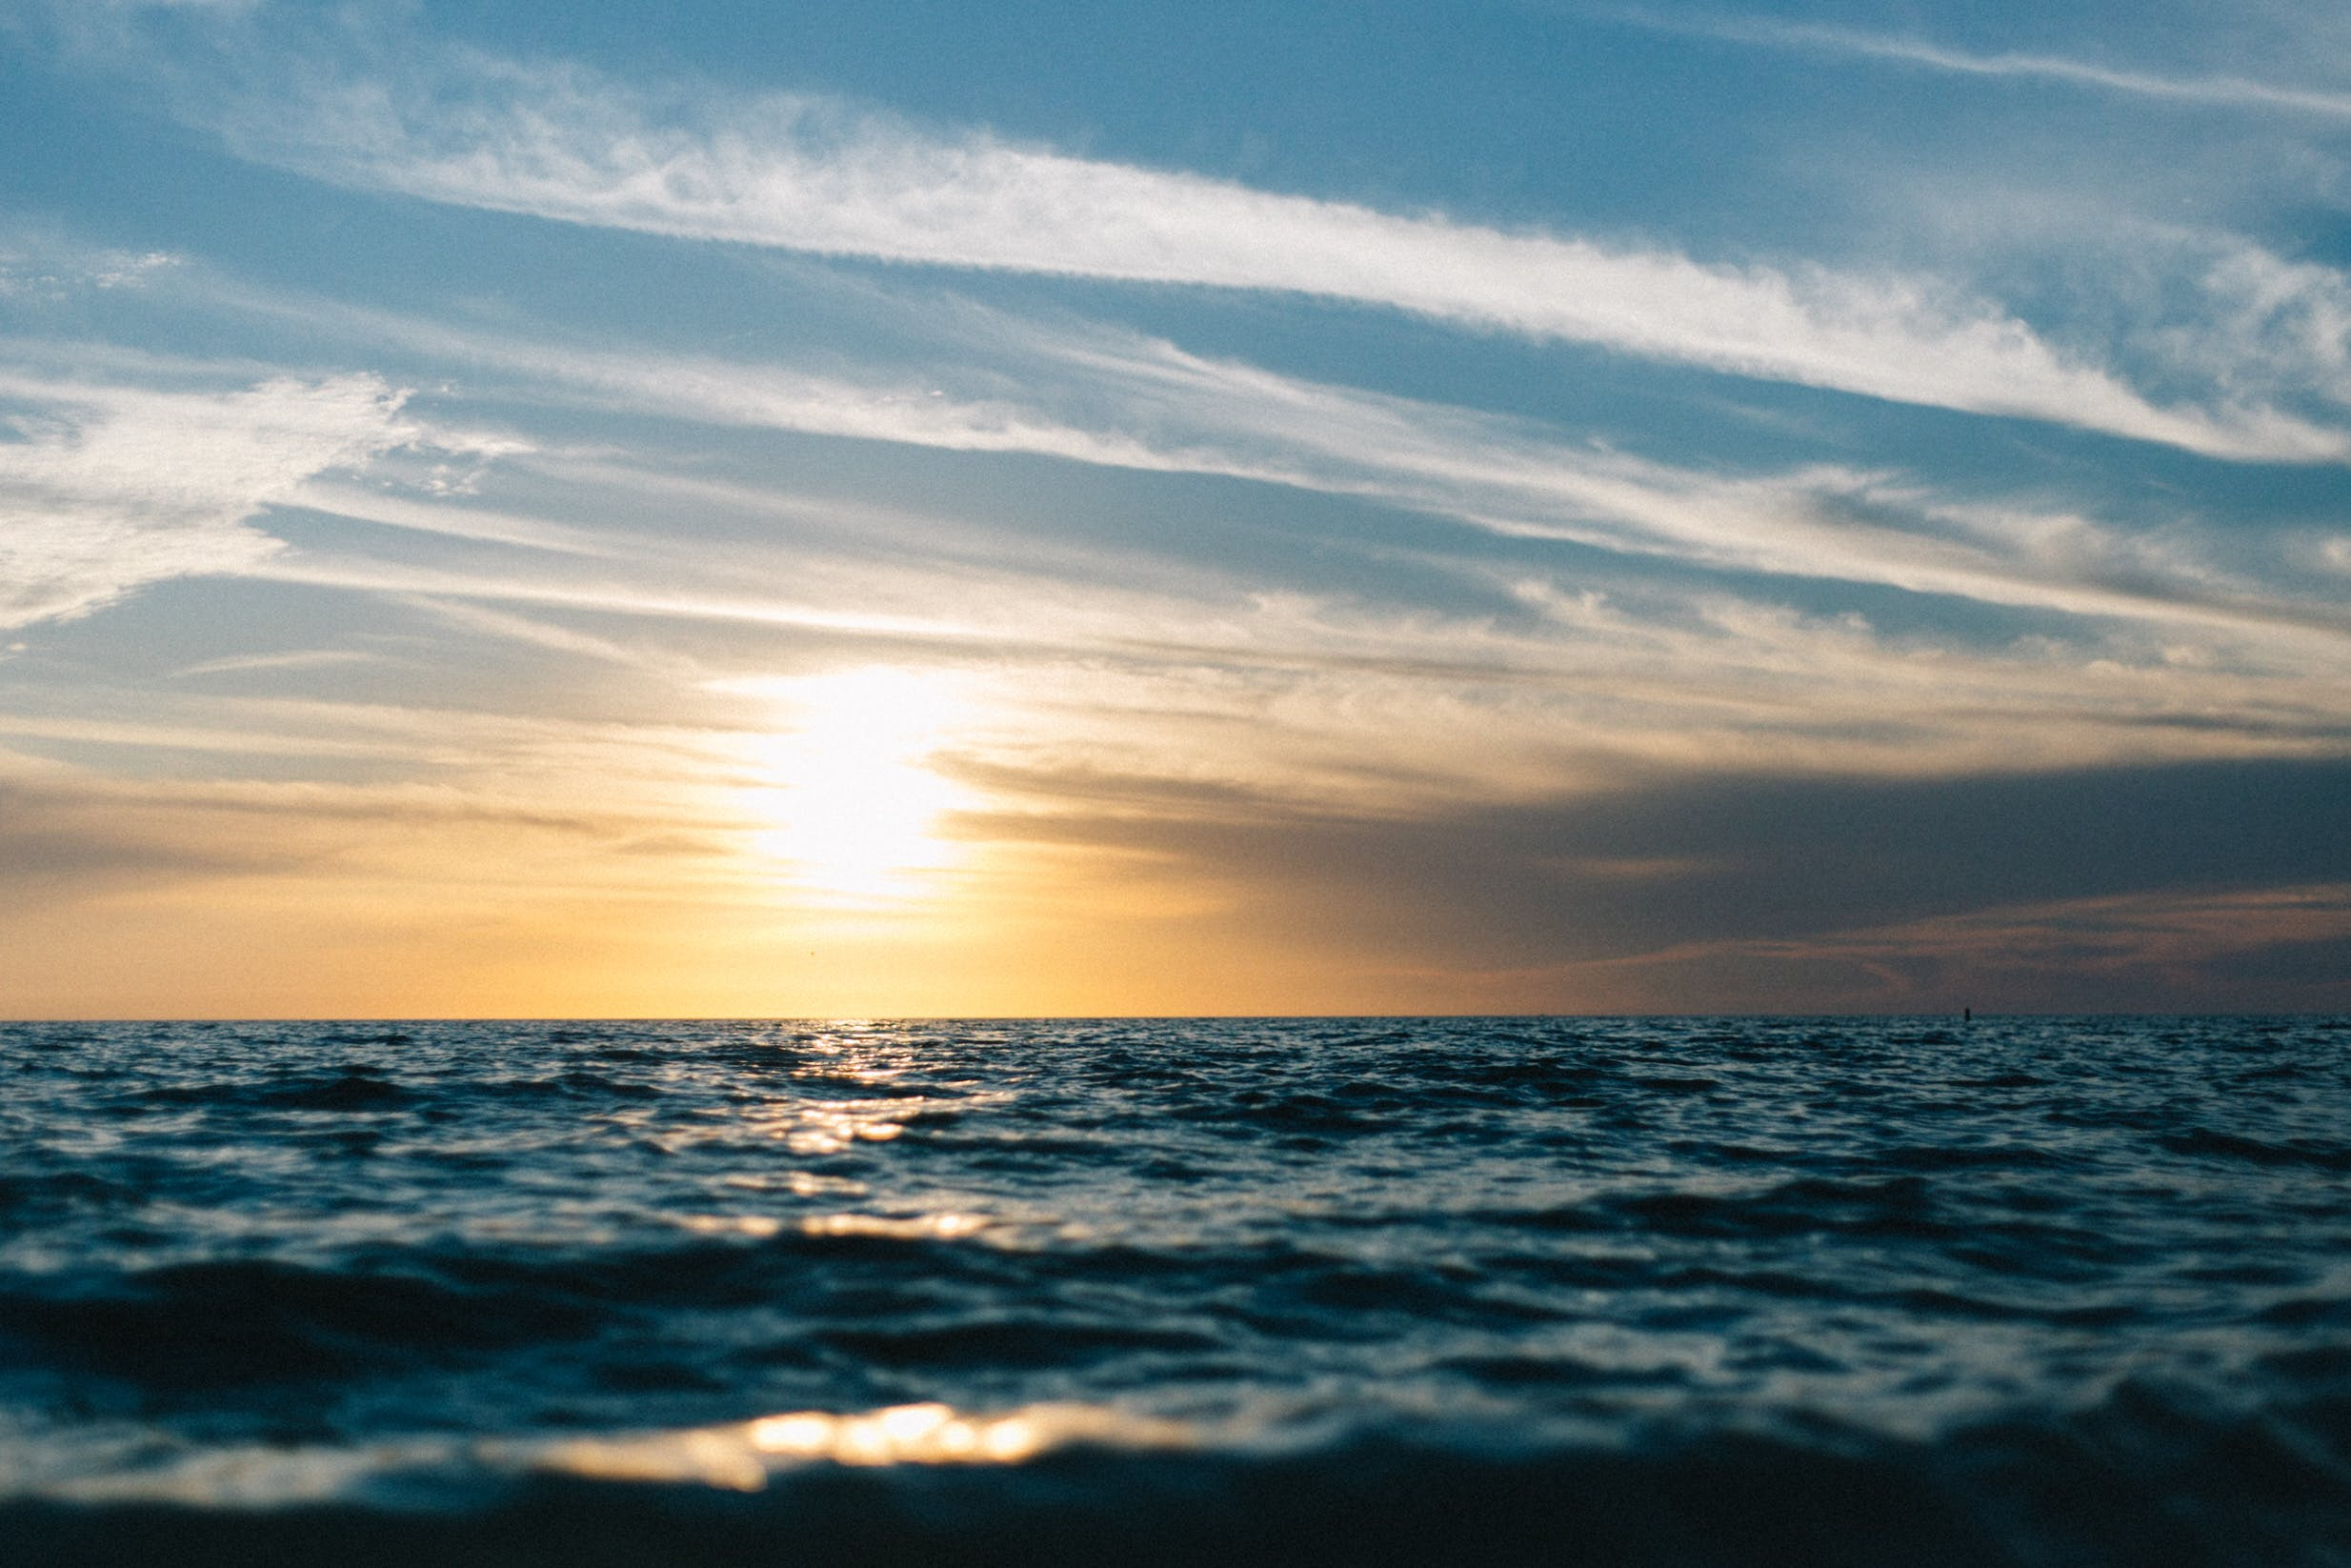 Gratis stockfoto met blikveld, gouden uur, h2o, hemel